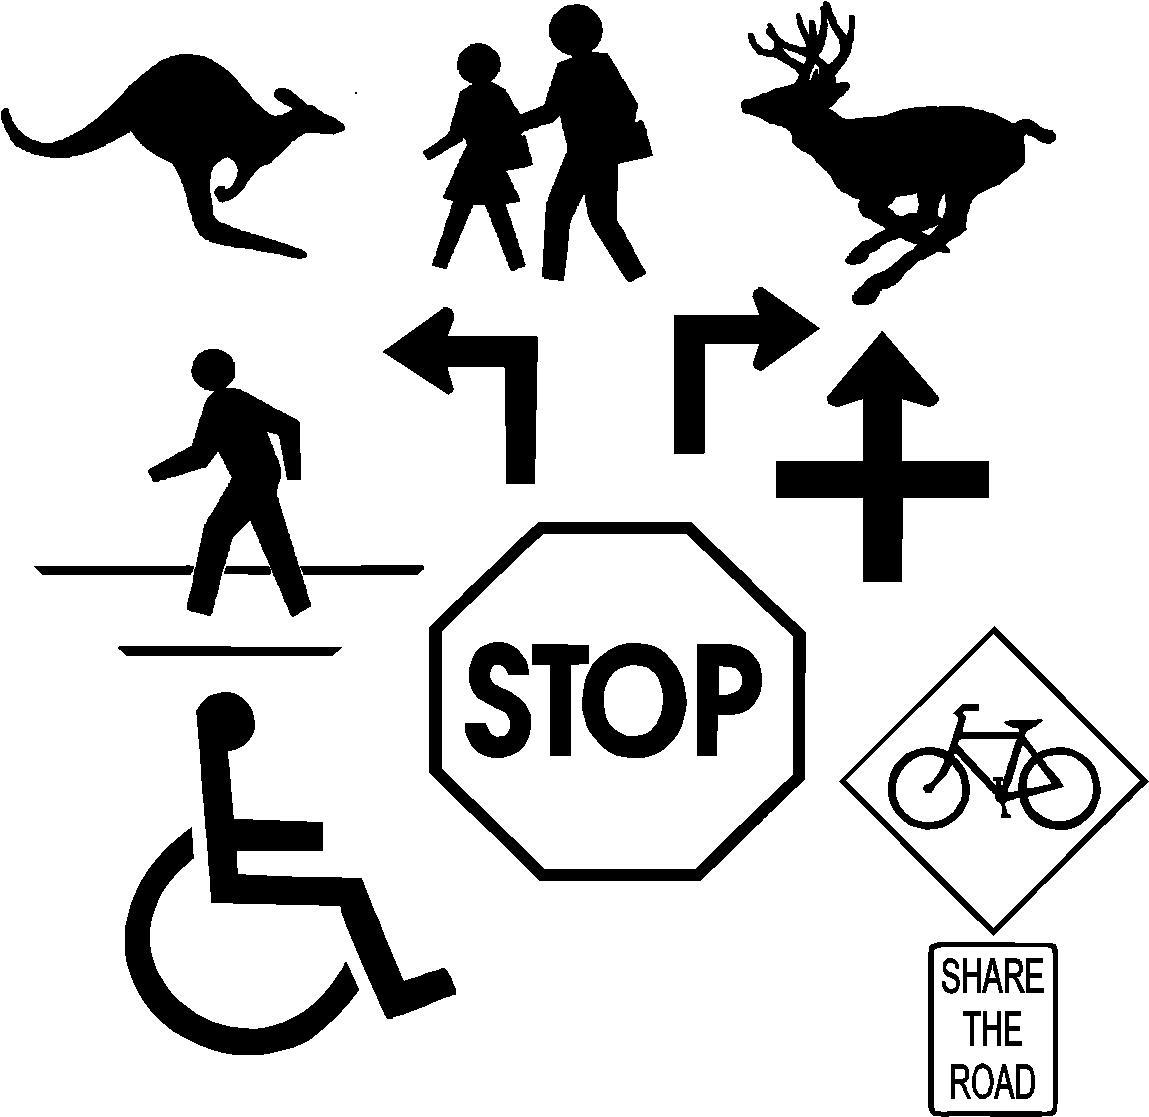 Free Street Stop Sign And Handicap Logo Vector Clip